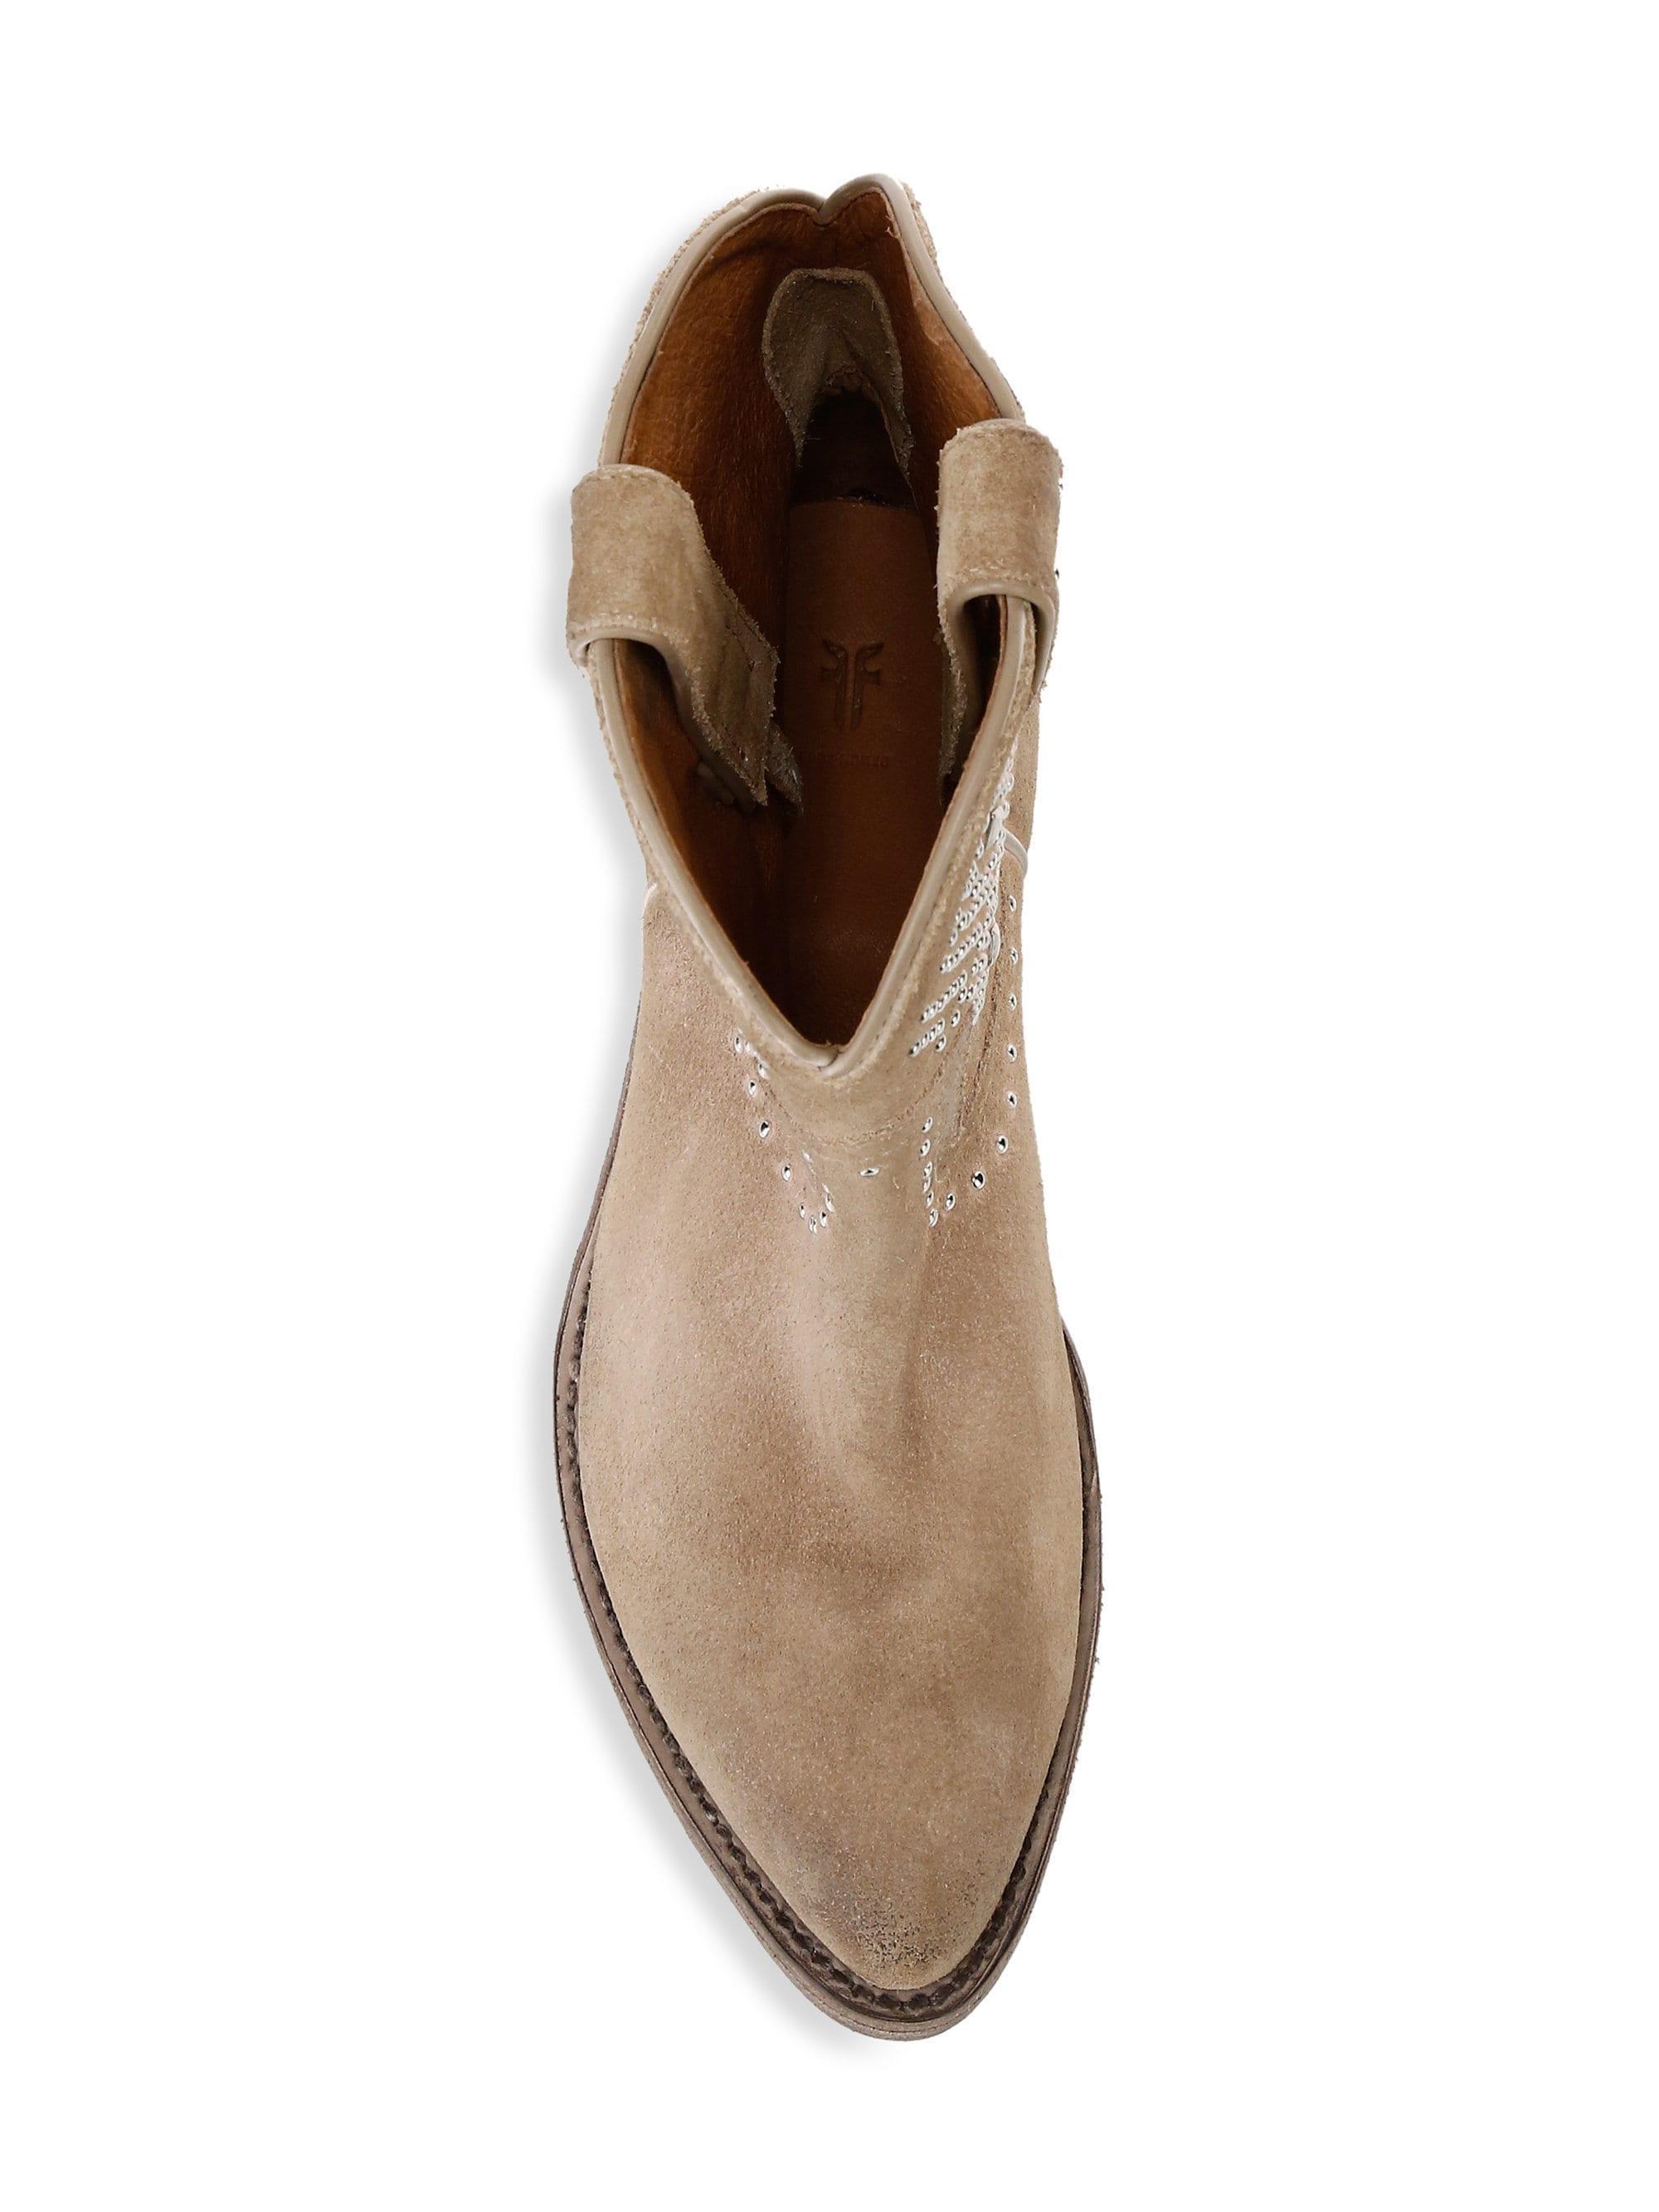 5cf77e310a8 Lyst - Frye Women's Billy Studded Suede Short Cowboy Boots - Tan ...